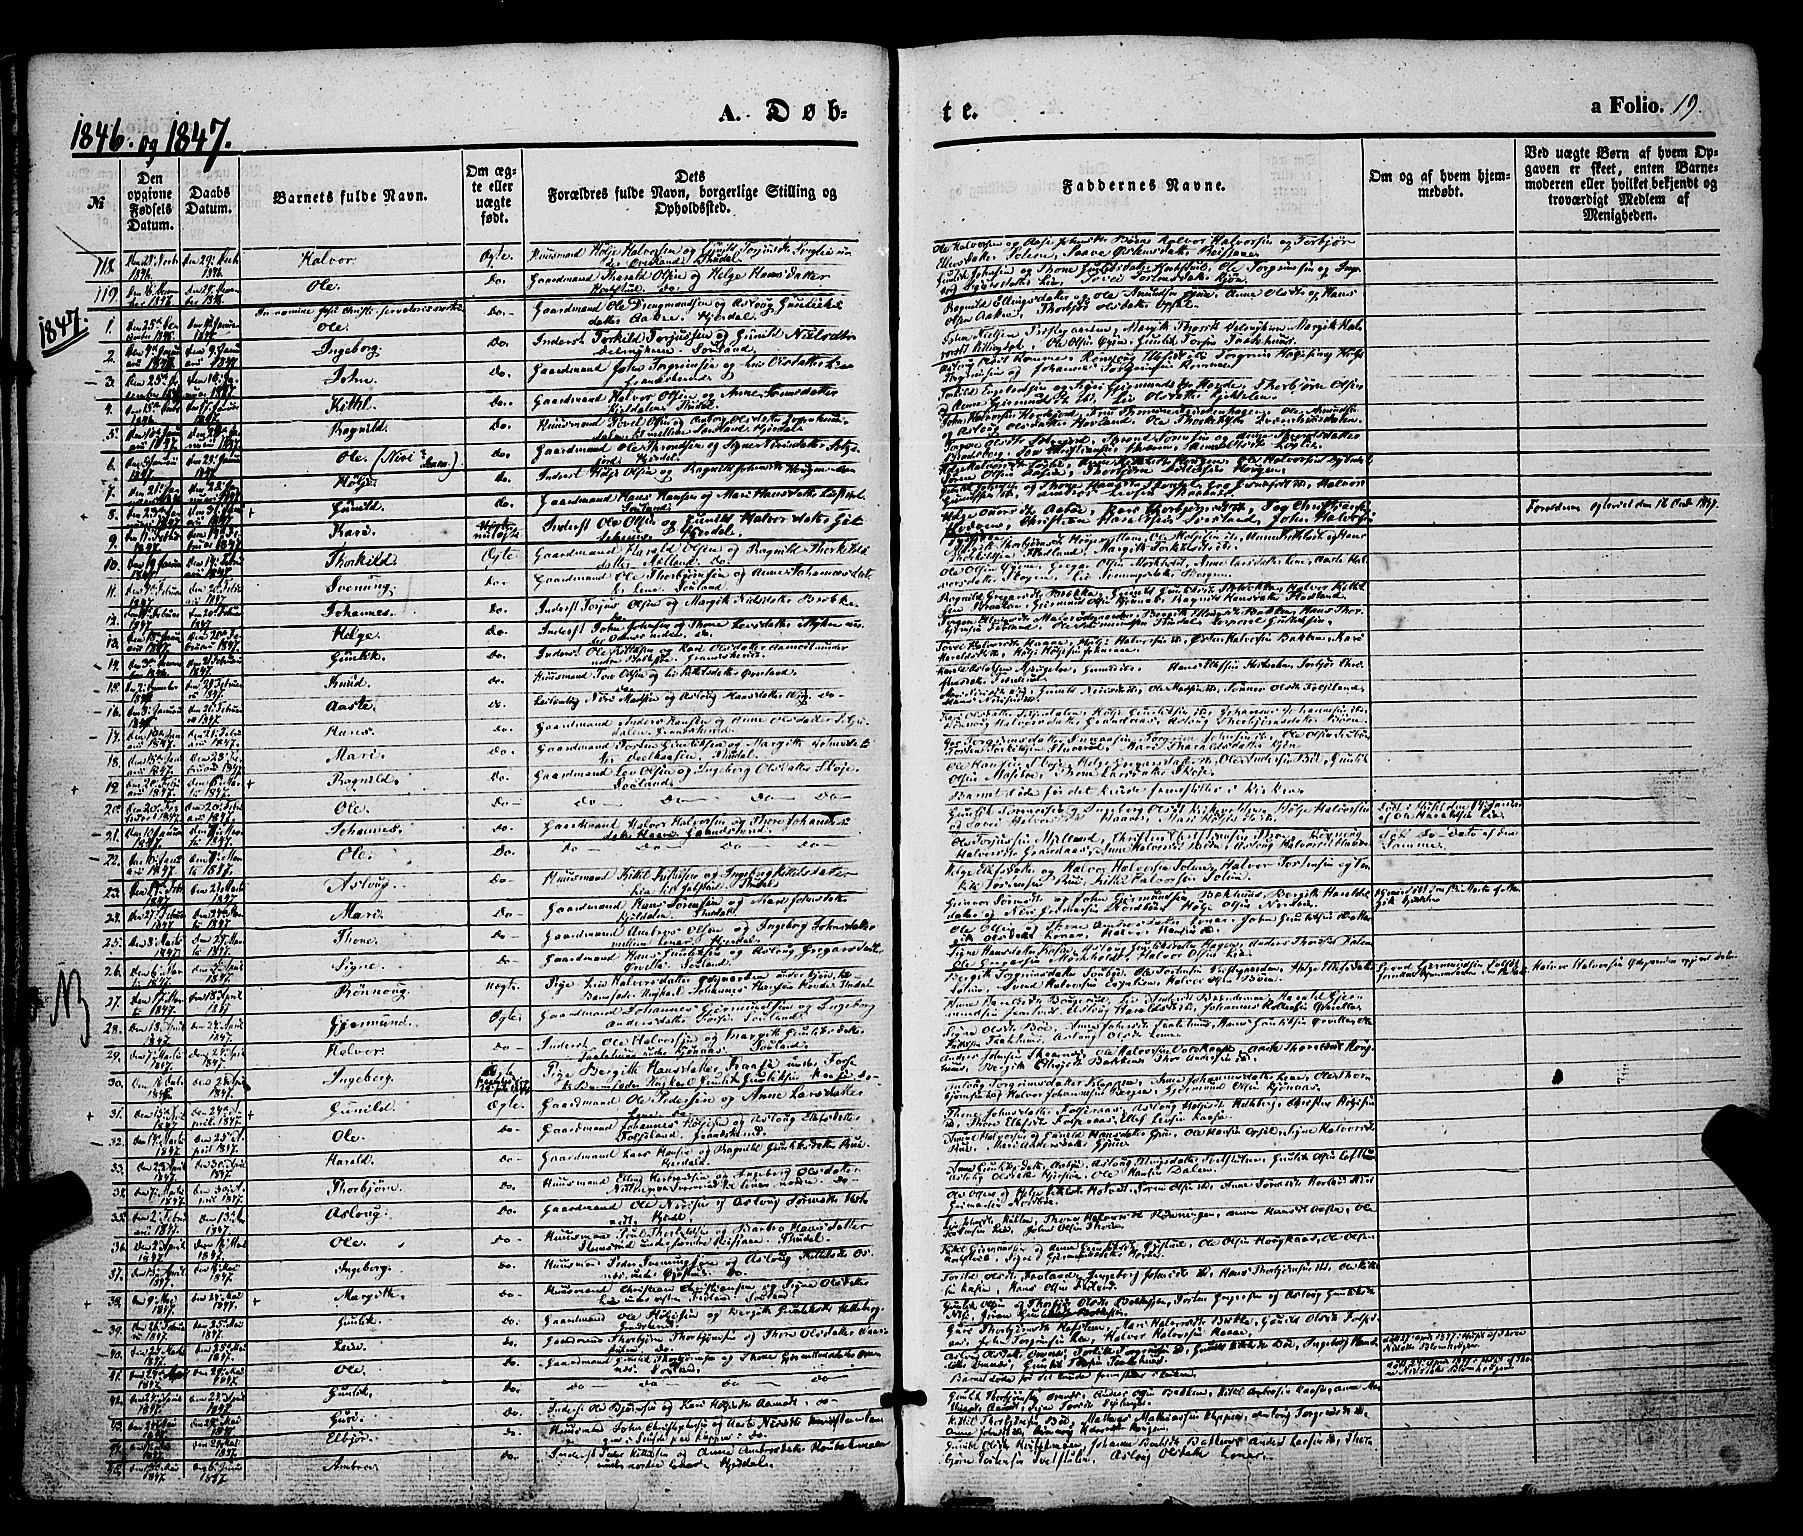 SAKO, Hjartdal kirkebøker, F/Fa/L0008: Ministerialbok nr. I 8, 1844-1859, s. 19